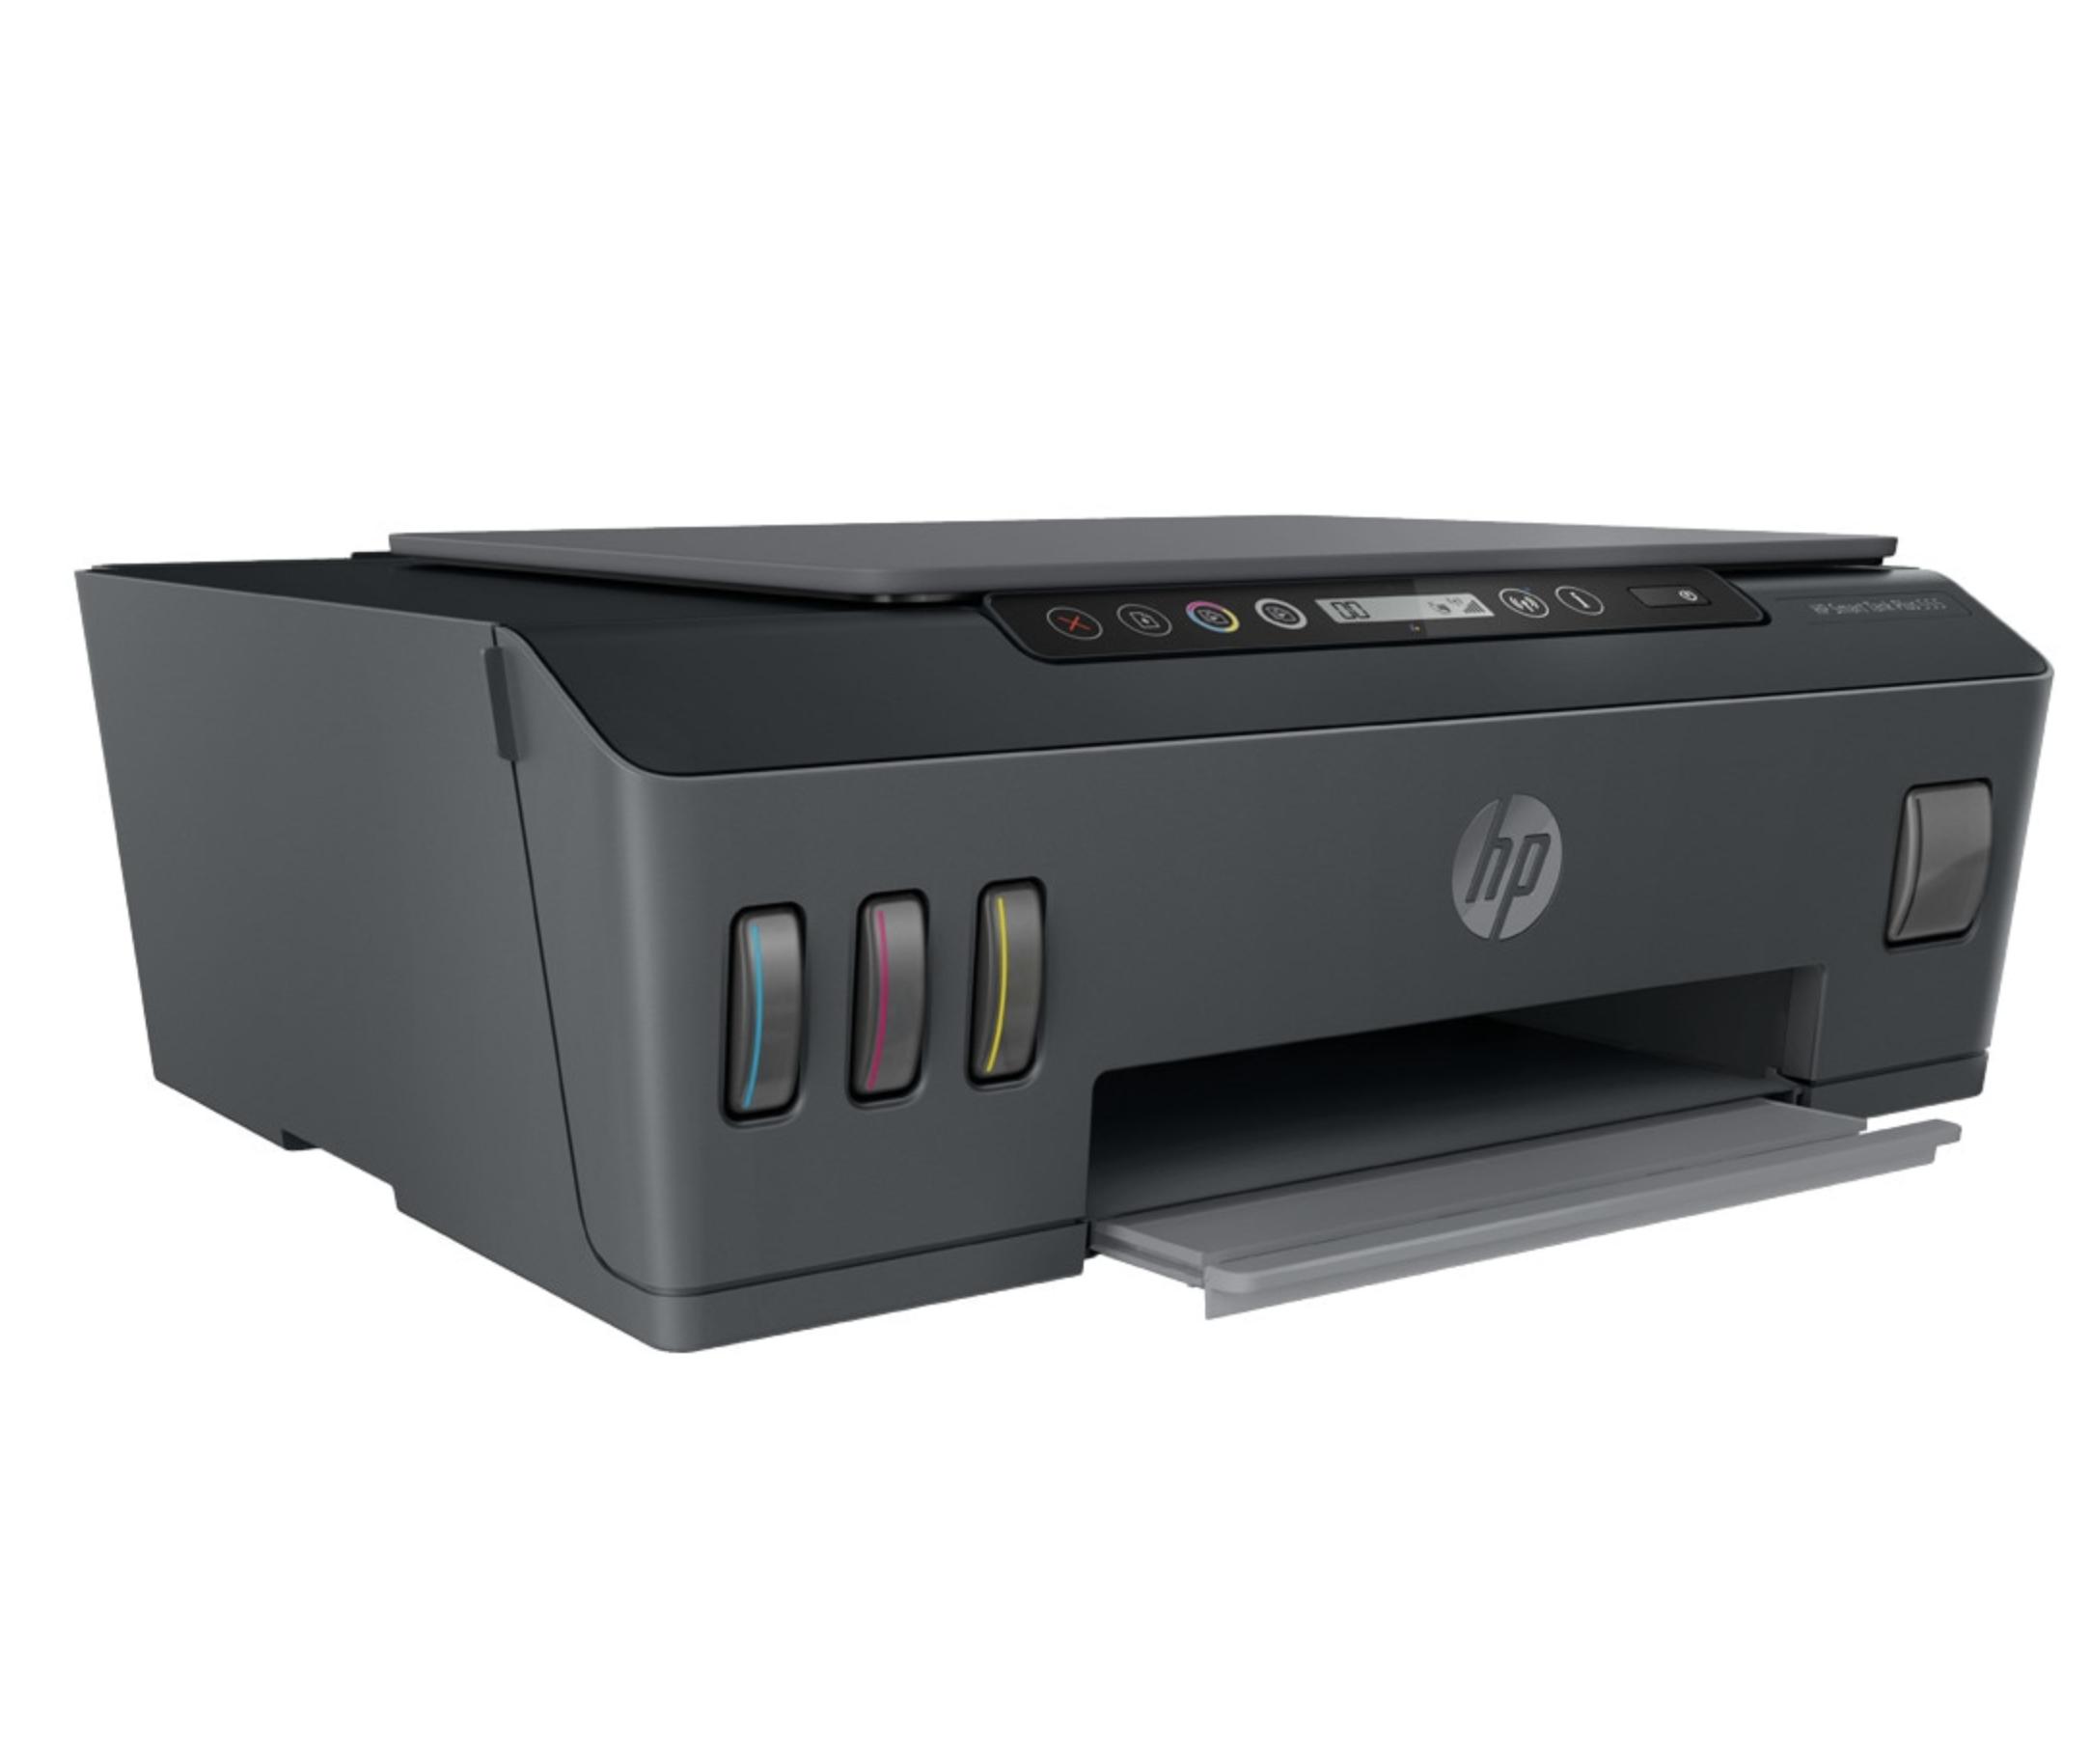 Impresora Multifunción Tinta HP Smart Tank 555, Wi-Fi, copia, escanea